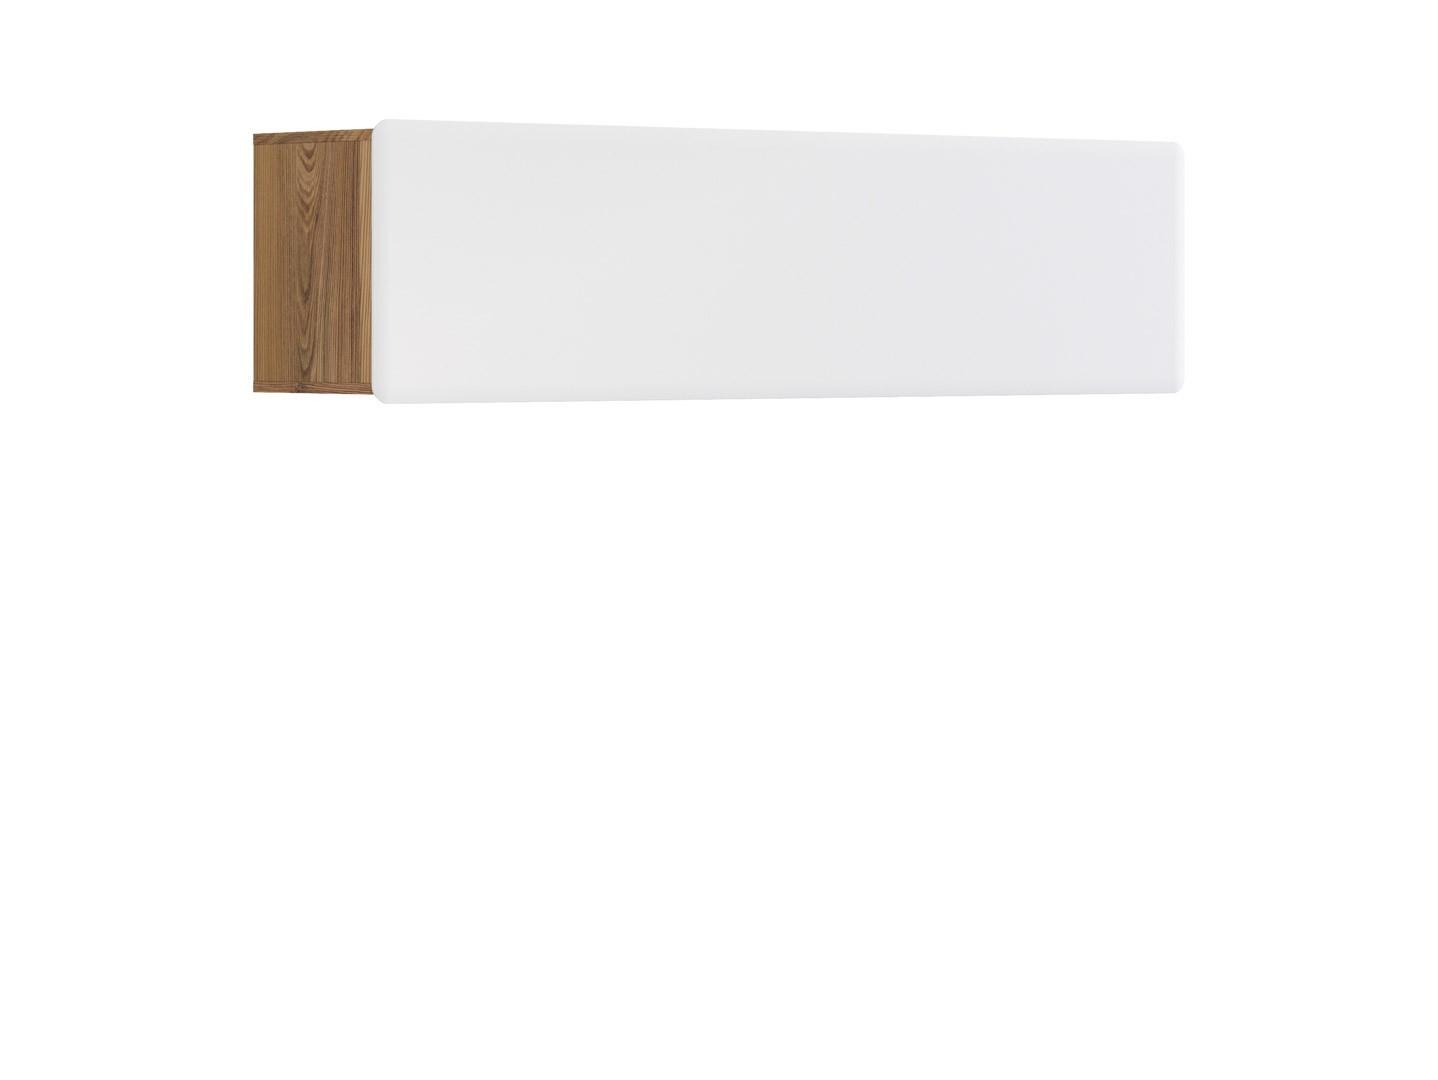 Polička - BRW - Possi Light - SFW1K/4/16 (modřín sibiu zlatý + lesk bílý)